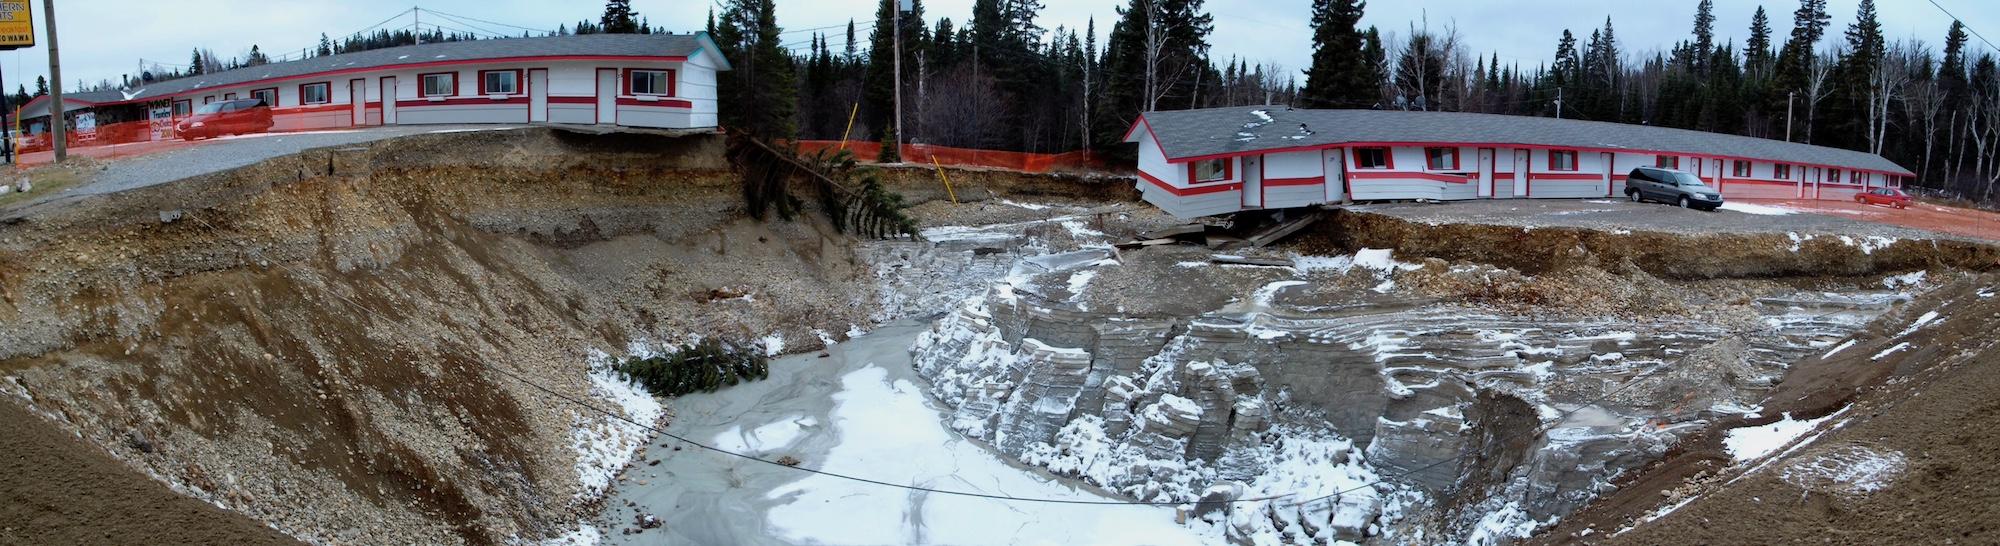 Wawa Northern Lights Motel Flood